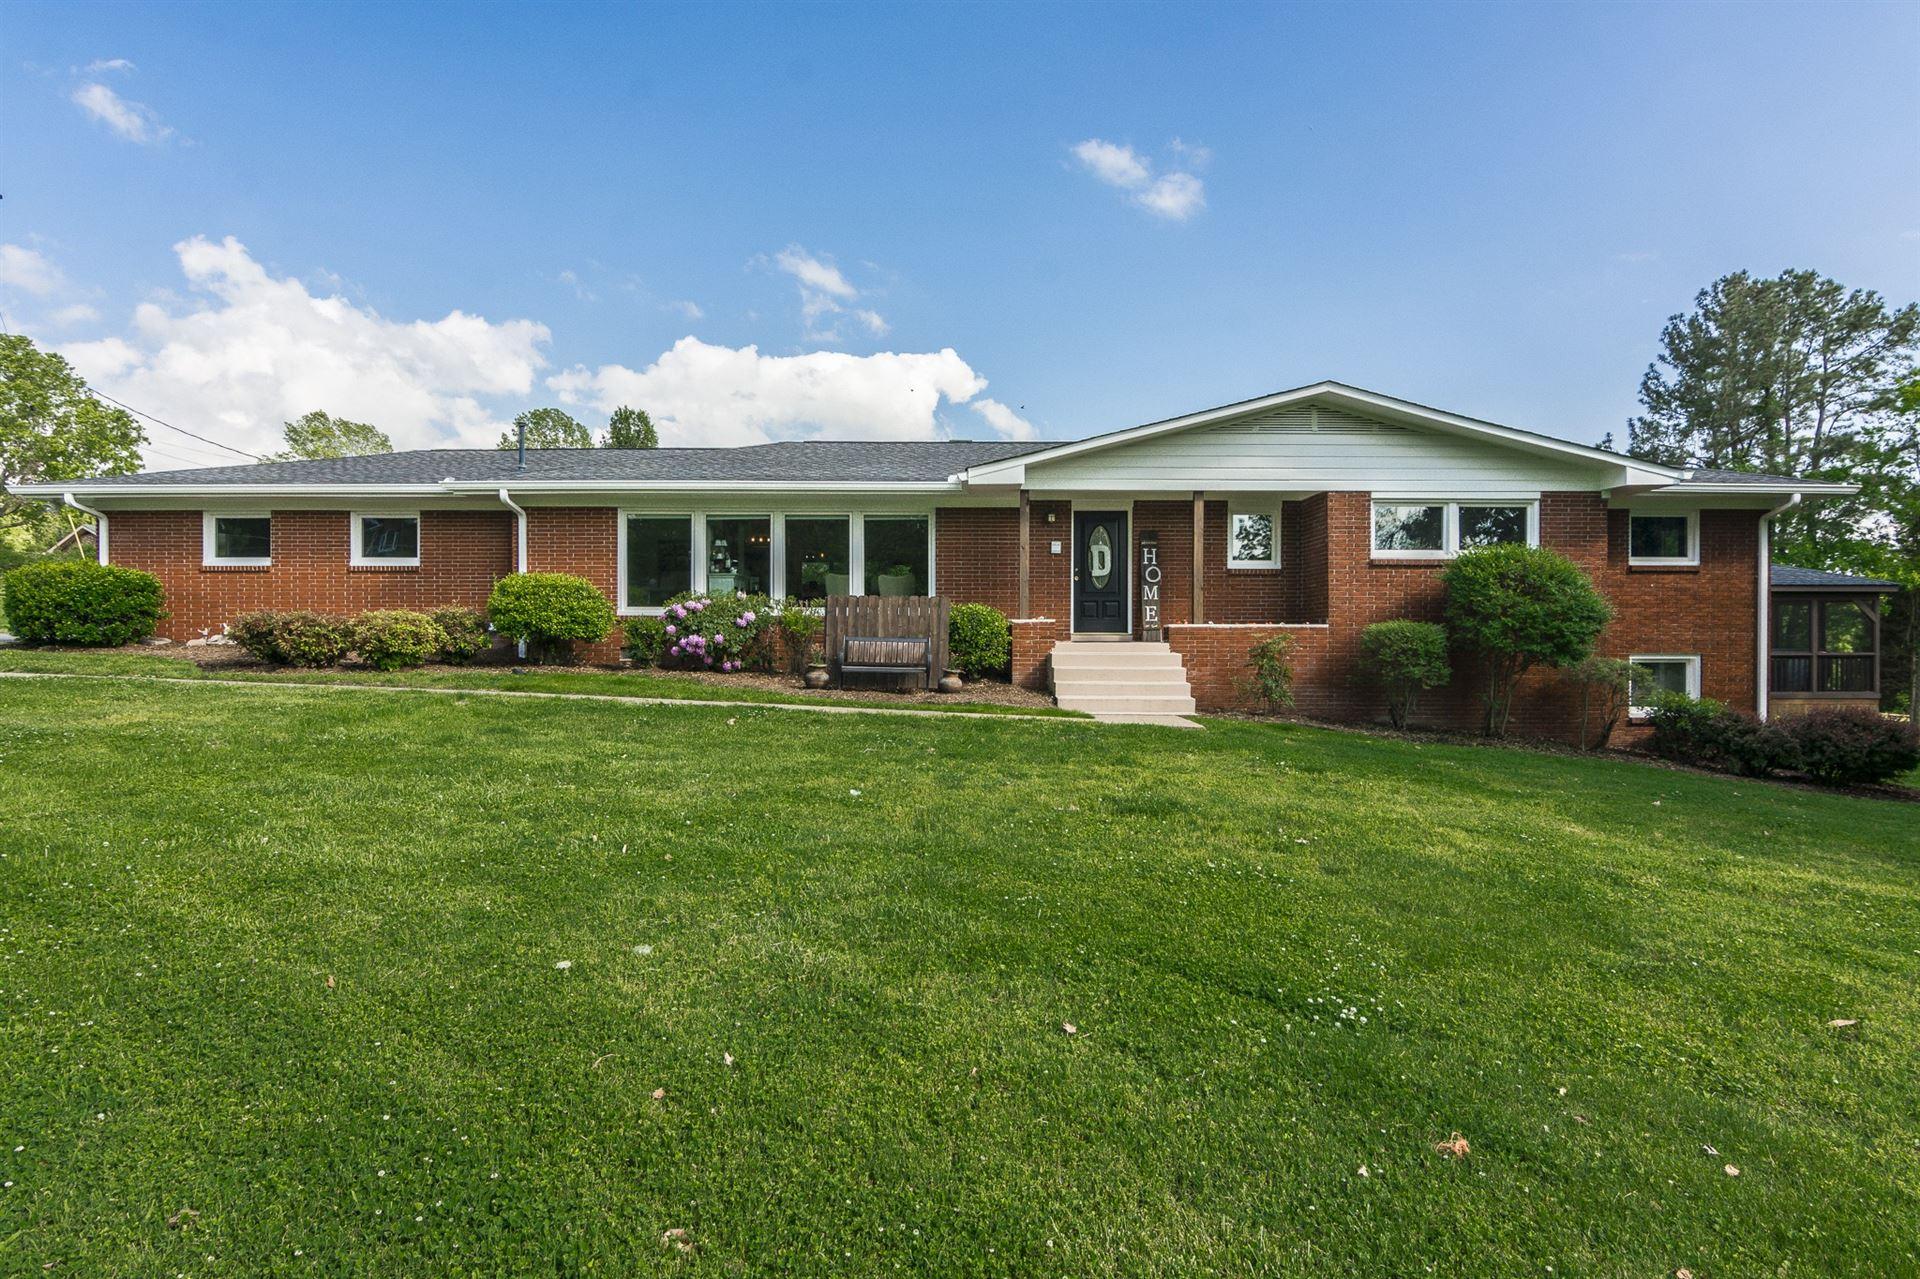 655 Cumberland Hills Dr, Hendersonville, TN 37075 - MLS#: 2251219